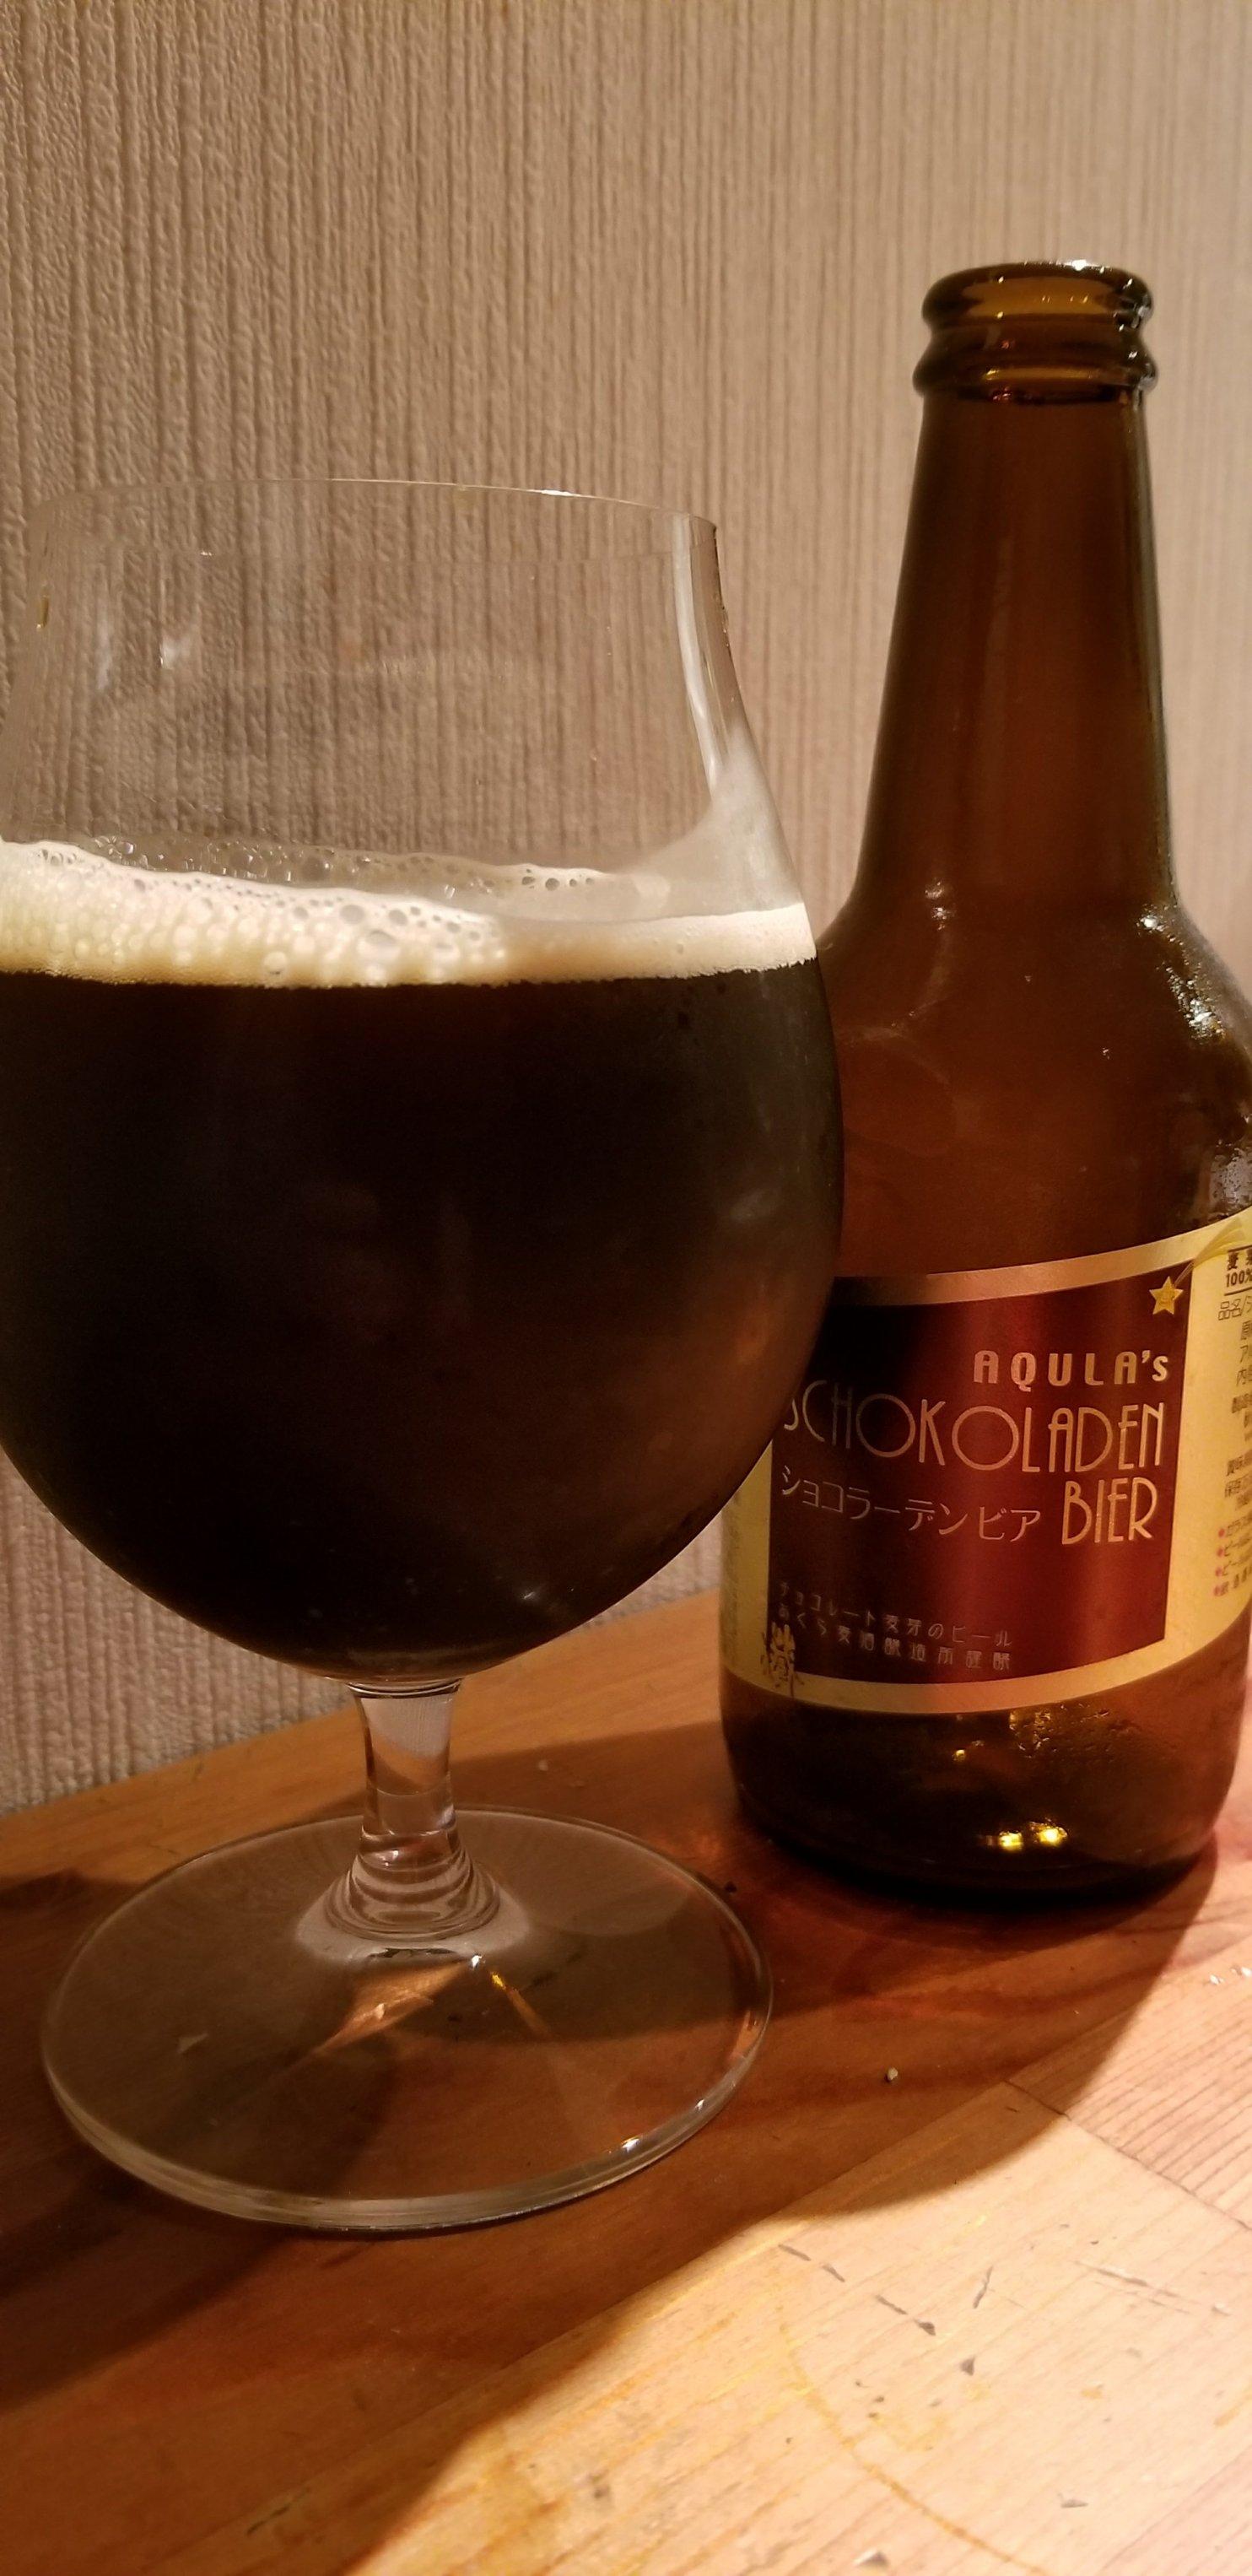 Aqula Schokoladen Bier